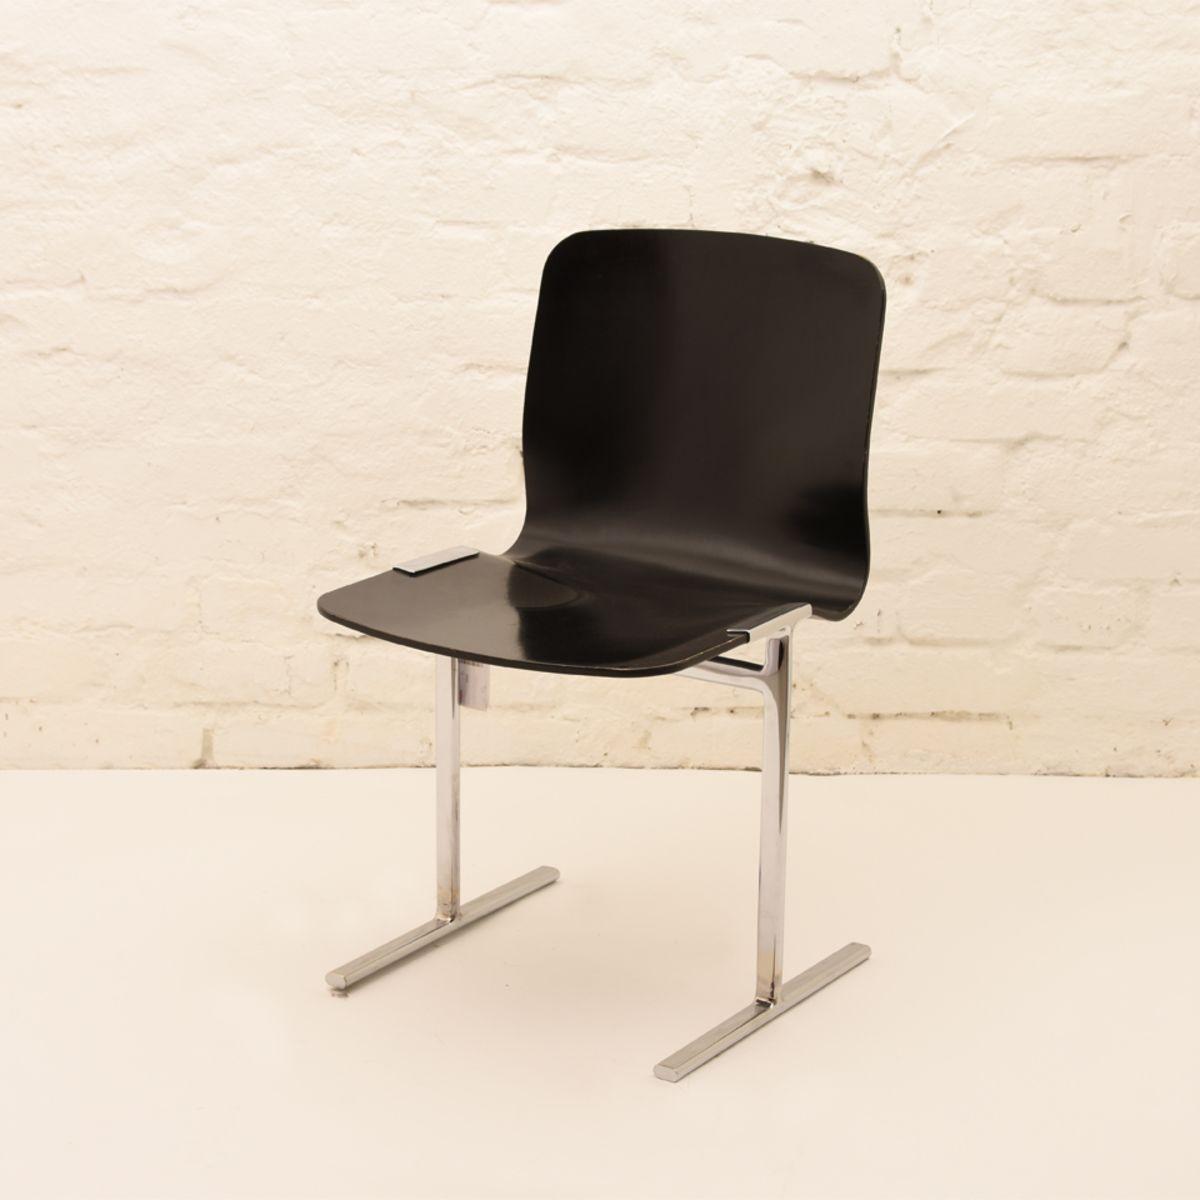 Antti-Nurmesniemi_Triennale-001-Chair